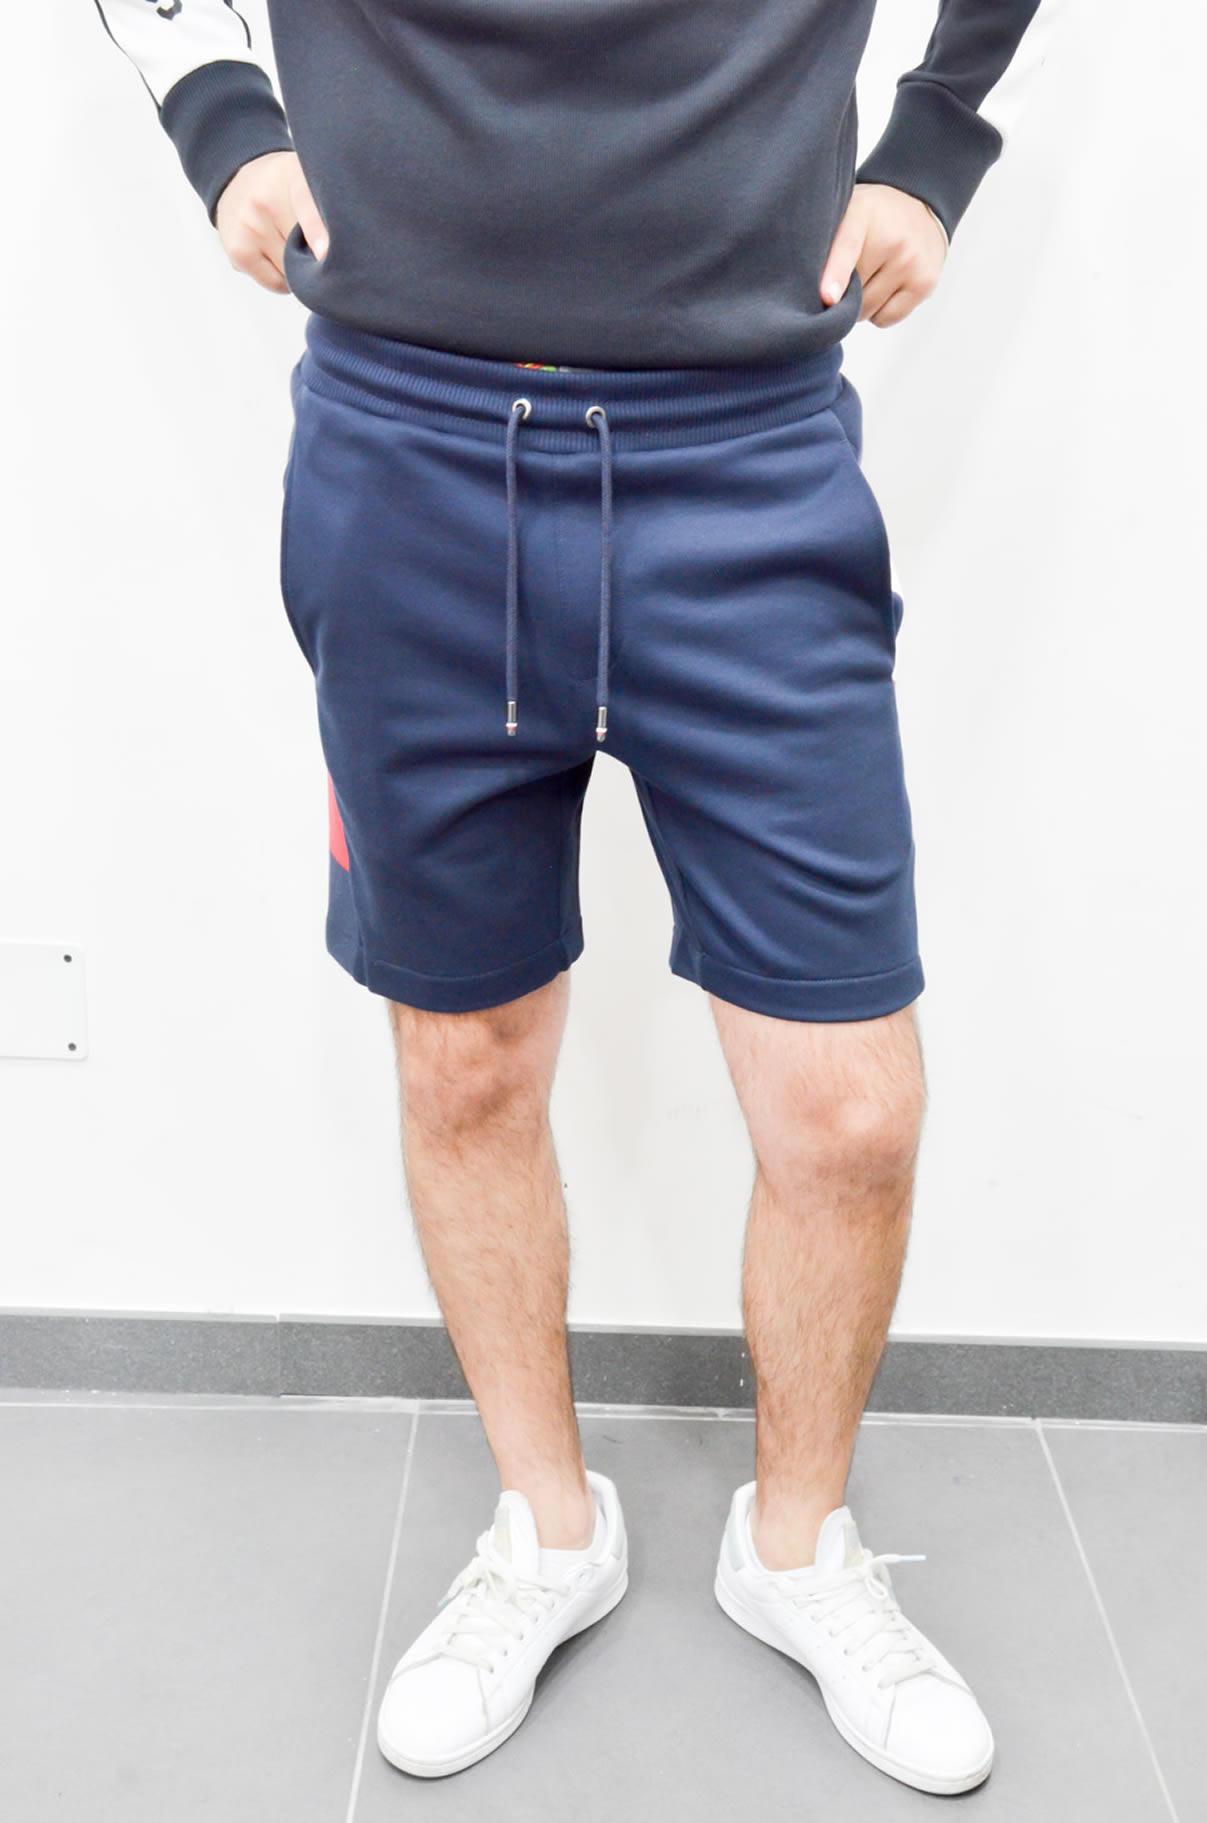 80d613463920 Tommy Hilfiger – Short in Tuta Uomo – Fashion Italy